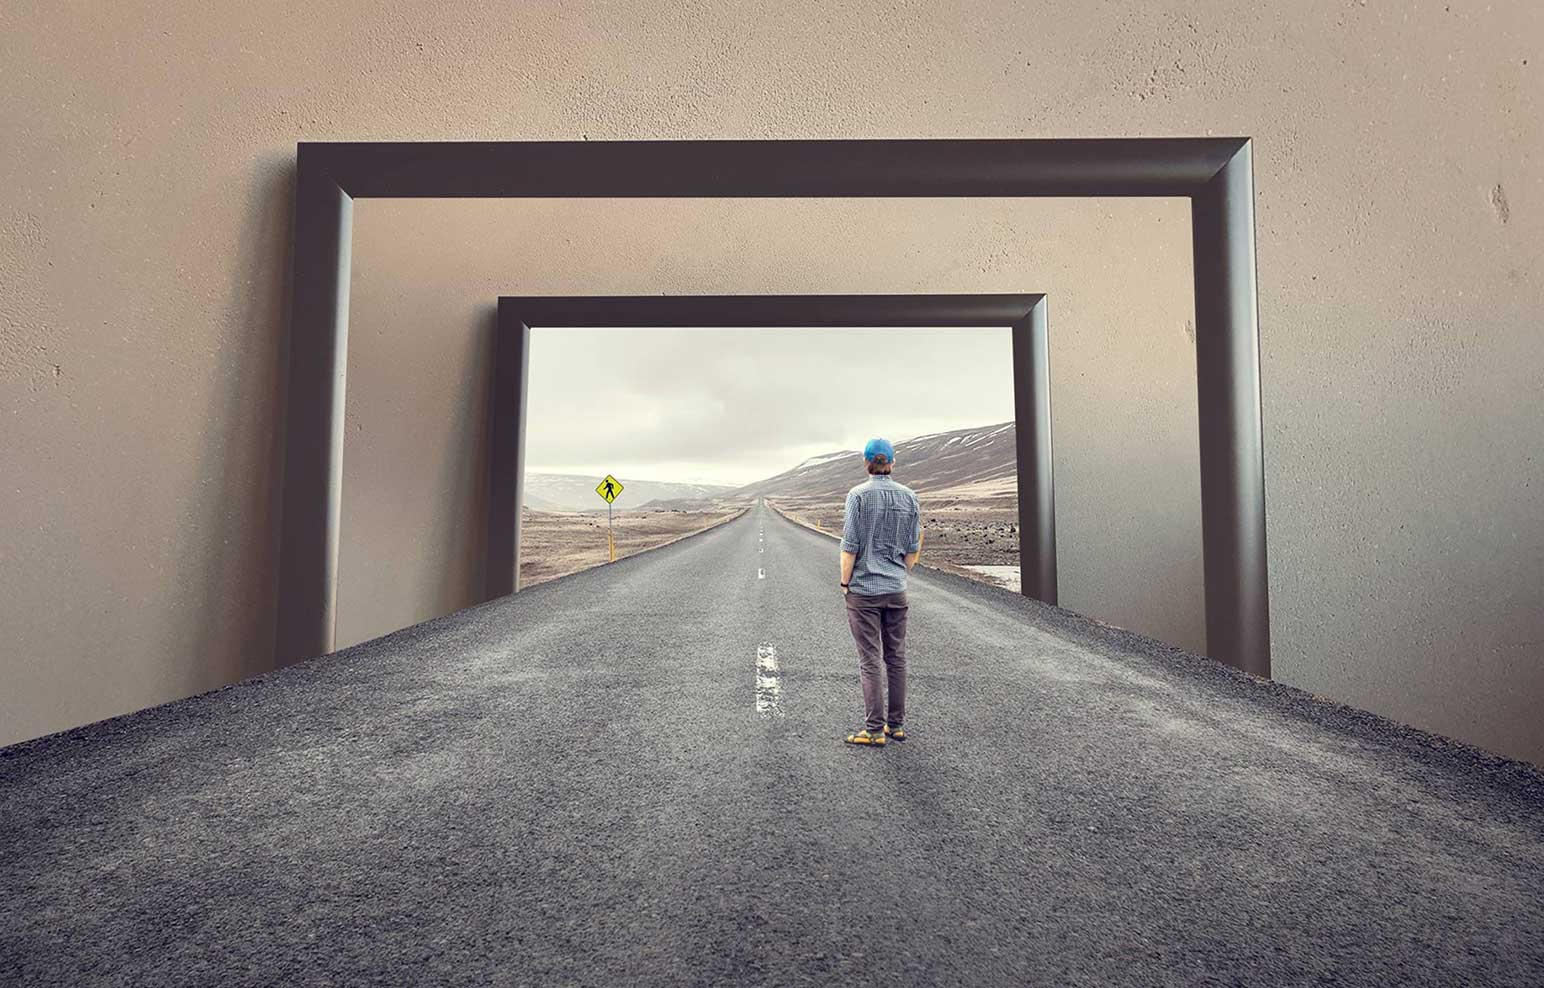 Paradoksalna fotografija kreirana vo Fotosop - Graficki dizajn, Парадоксална фотографија креирана во Фотошоп - Графички дизајн